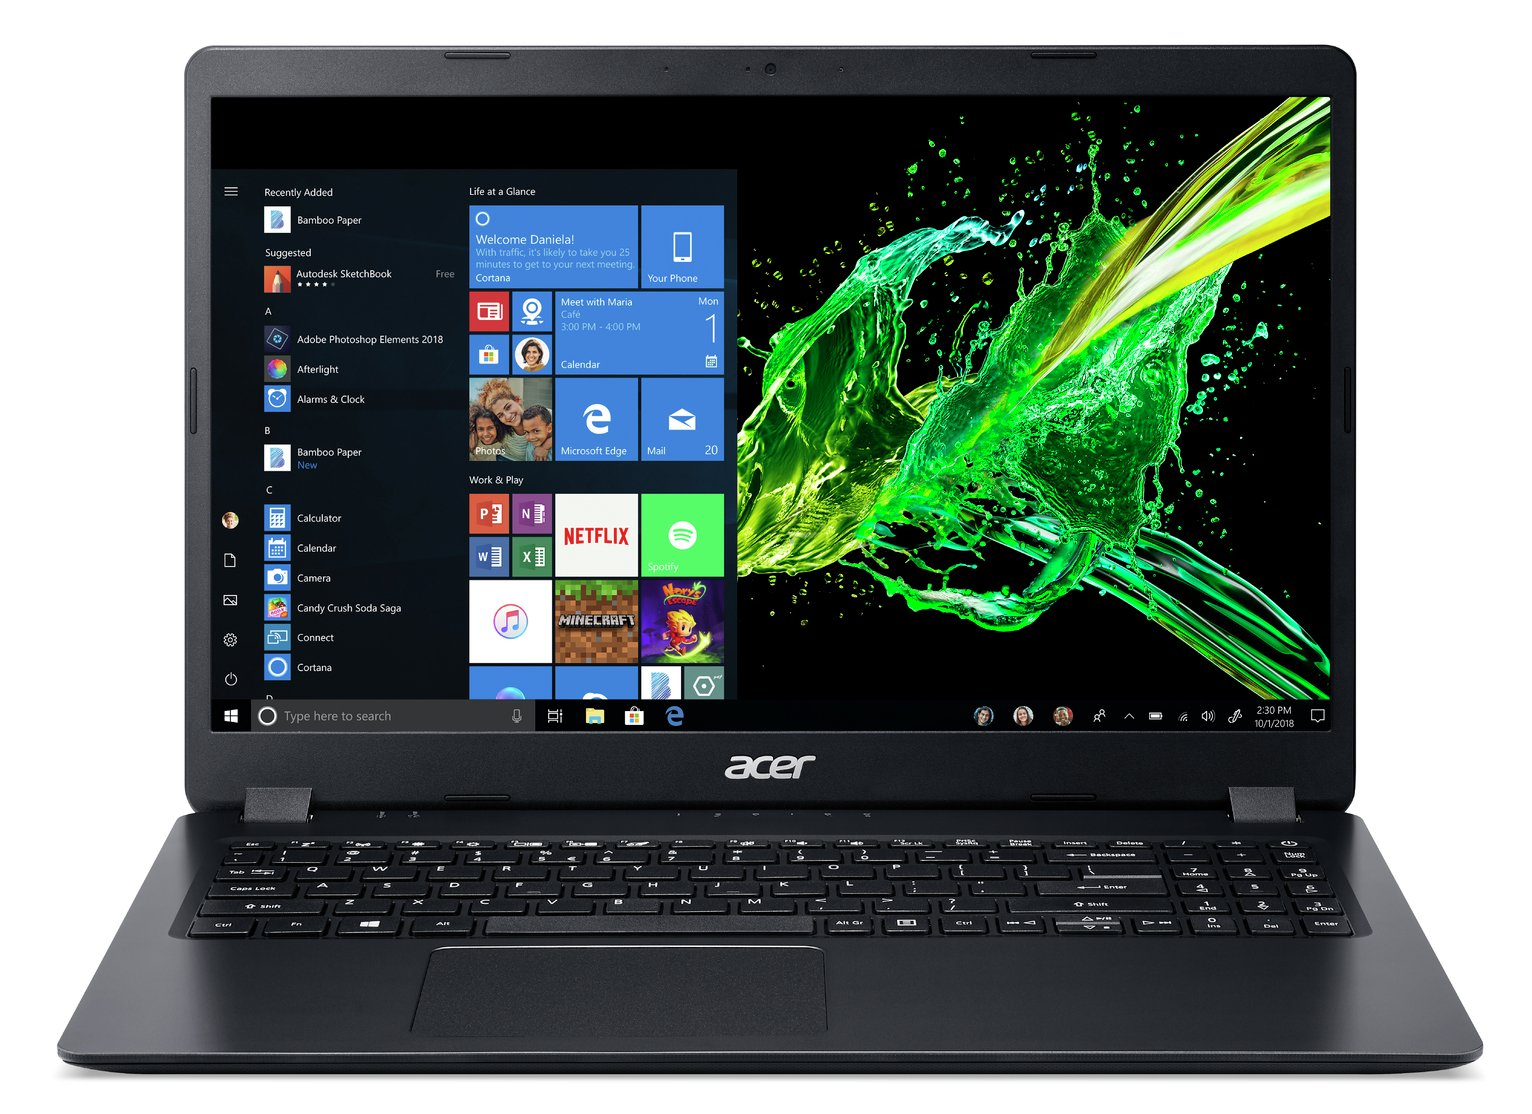 Acer Aspire 3 15.6in i5 8GB 2TB Laptop - Black